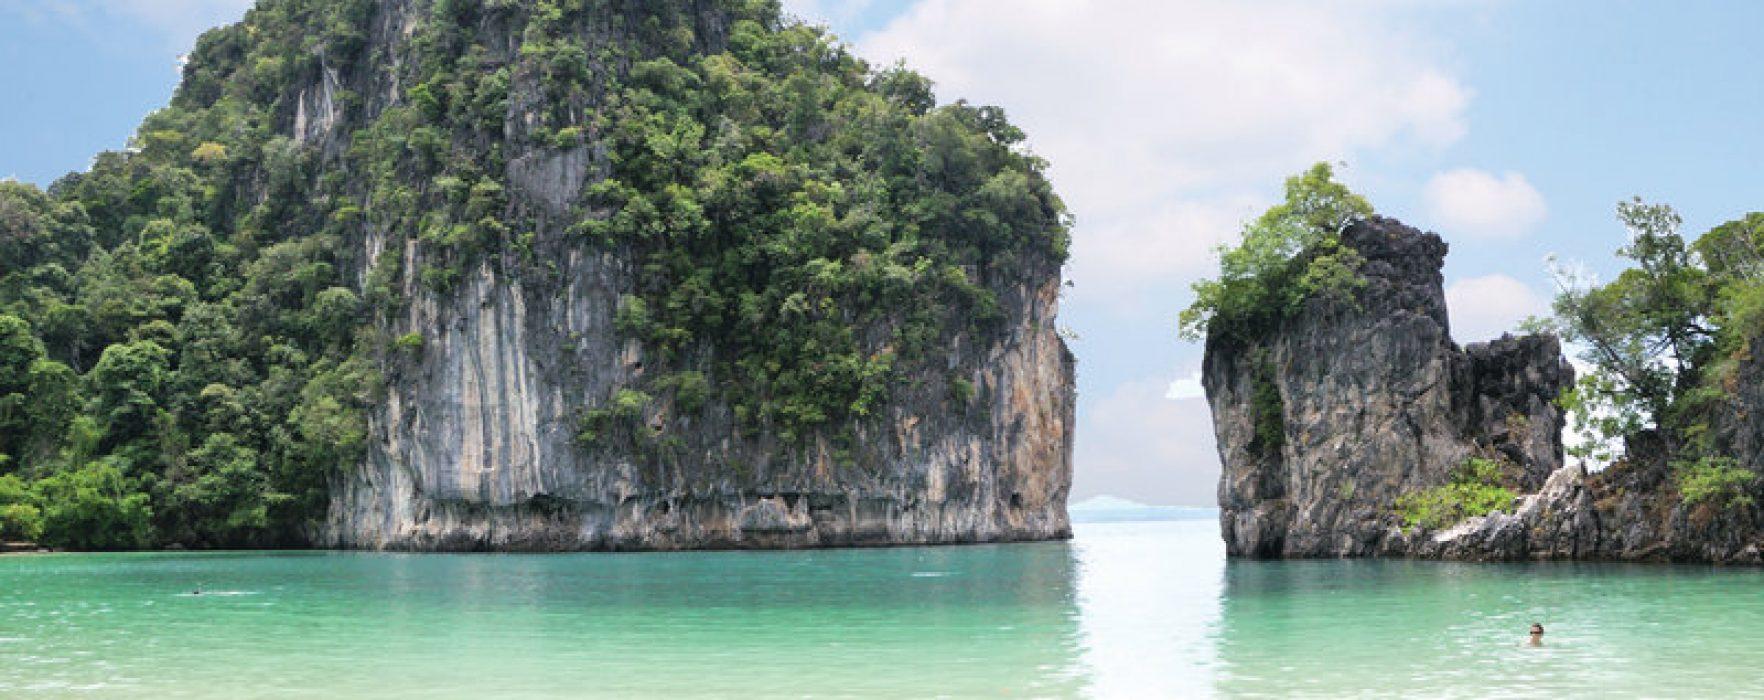 'Tis the season for tropical Thai escapes